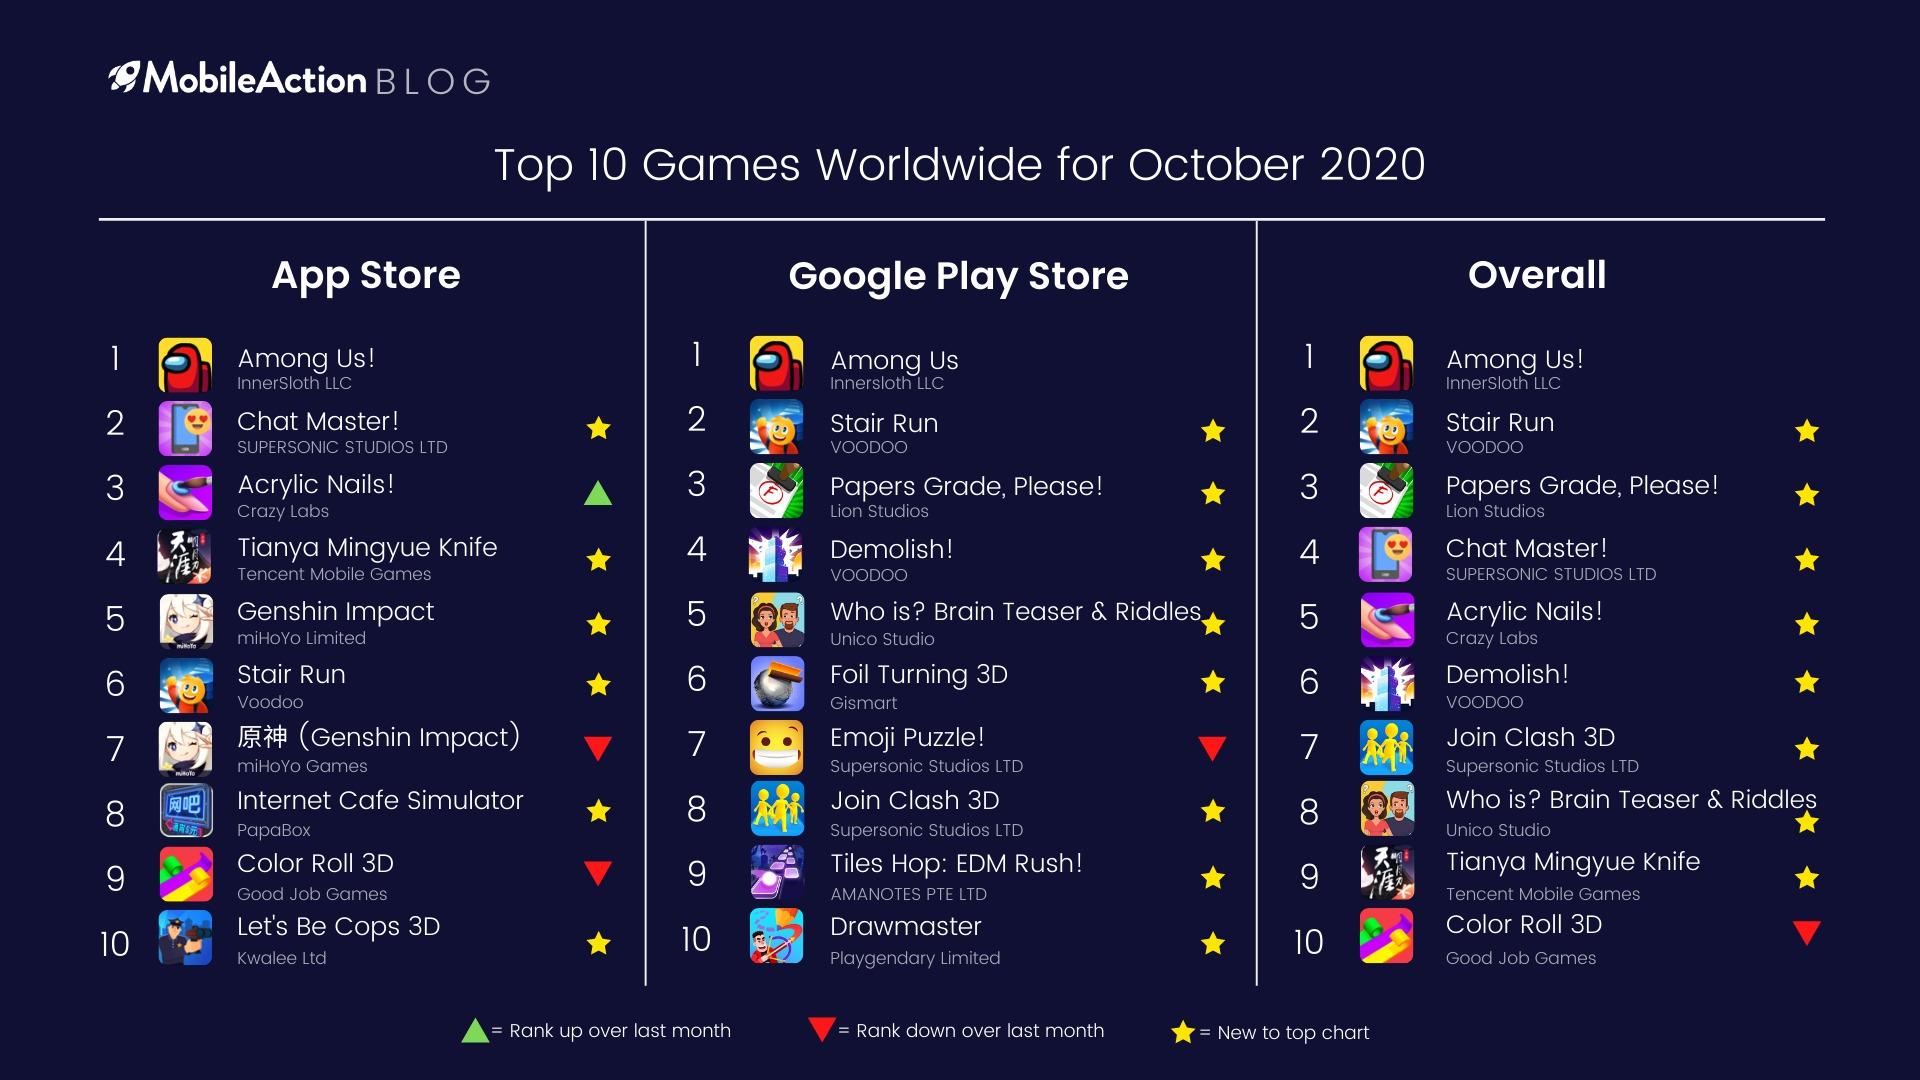 Top 10 Games Worldwide for October 2020